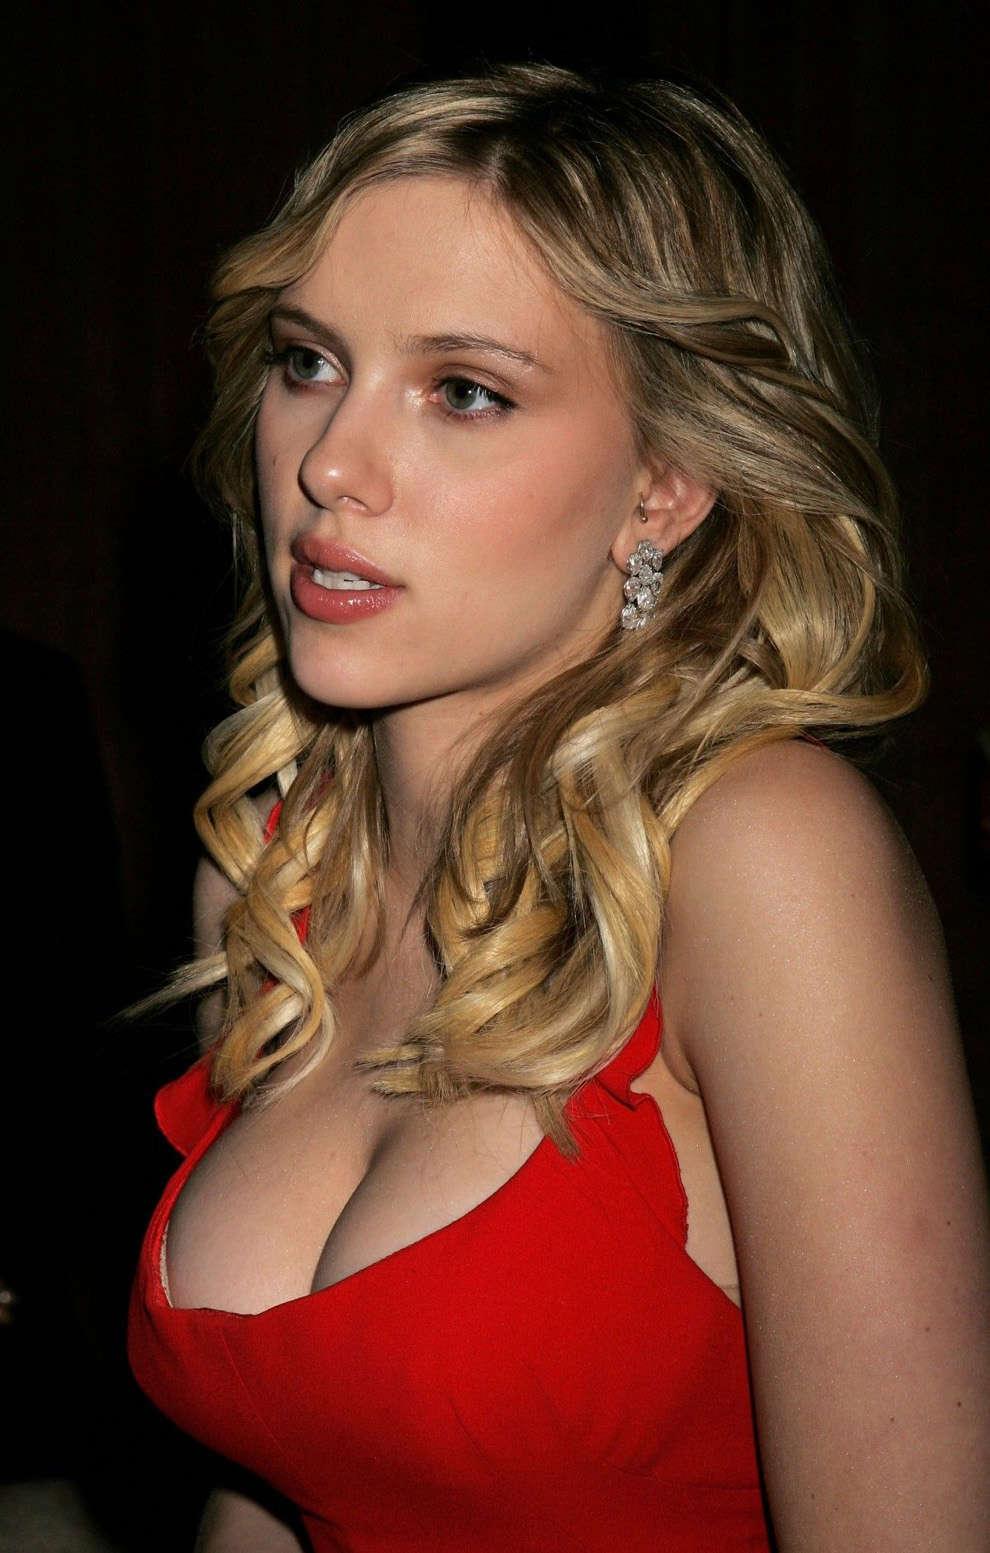 How To Make A Google Calendar Vs Cozi Outlook Calendar Vs Google Calendar Coolhead Tech Scarlett Johansson's Breasts Body Image Health Fitness